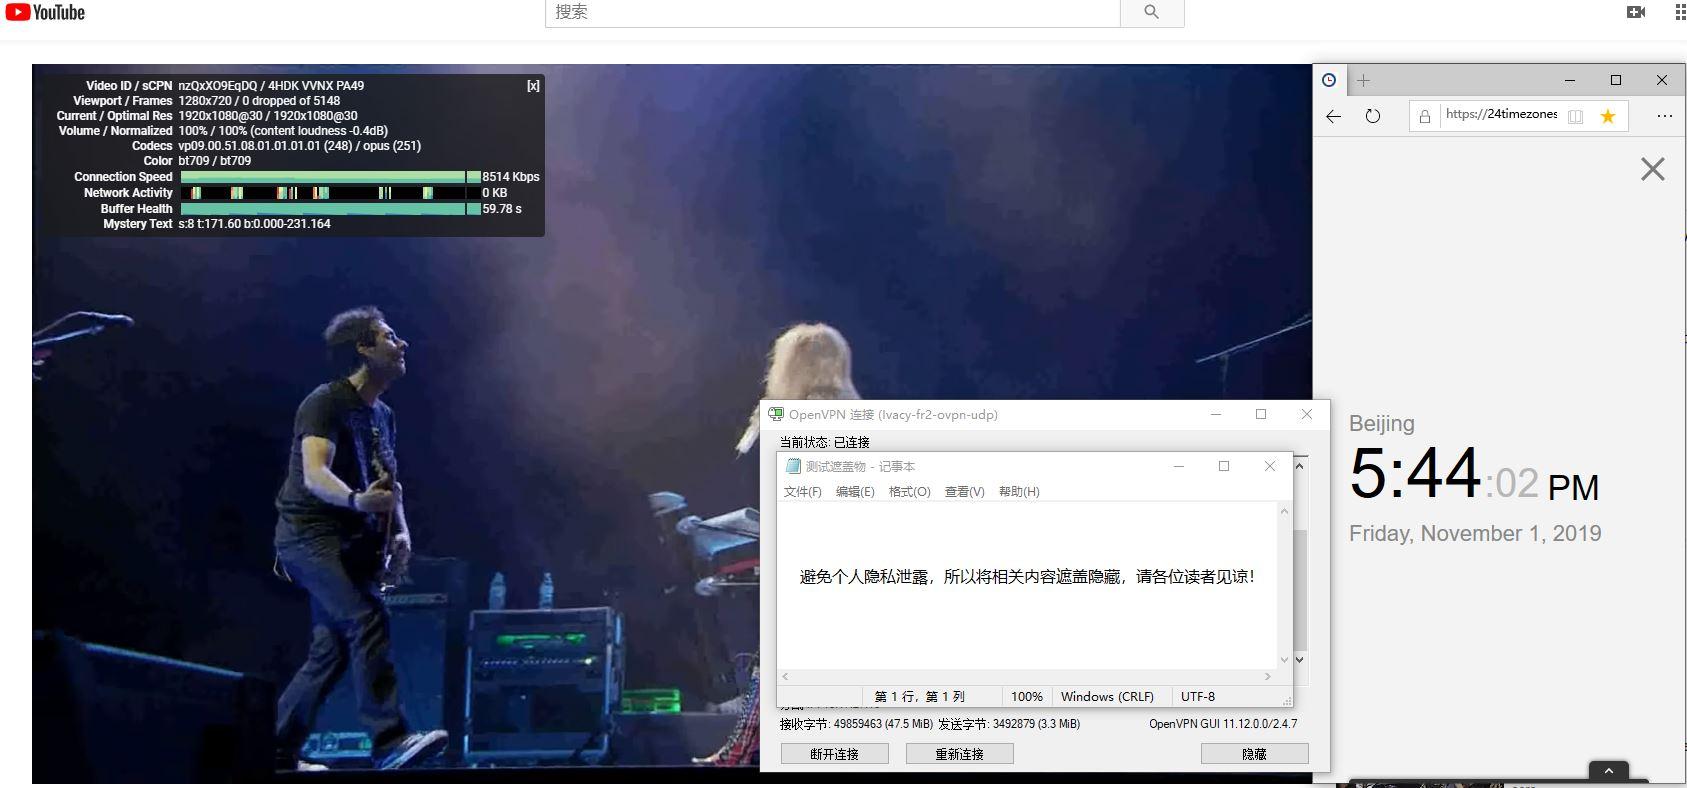 Windows IvacyVPN FR-2 中国VPN翻墙软件 科学上网 Youtube链接速度 - 20191101